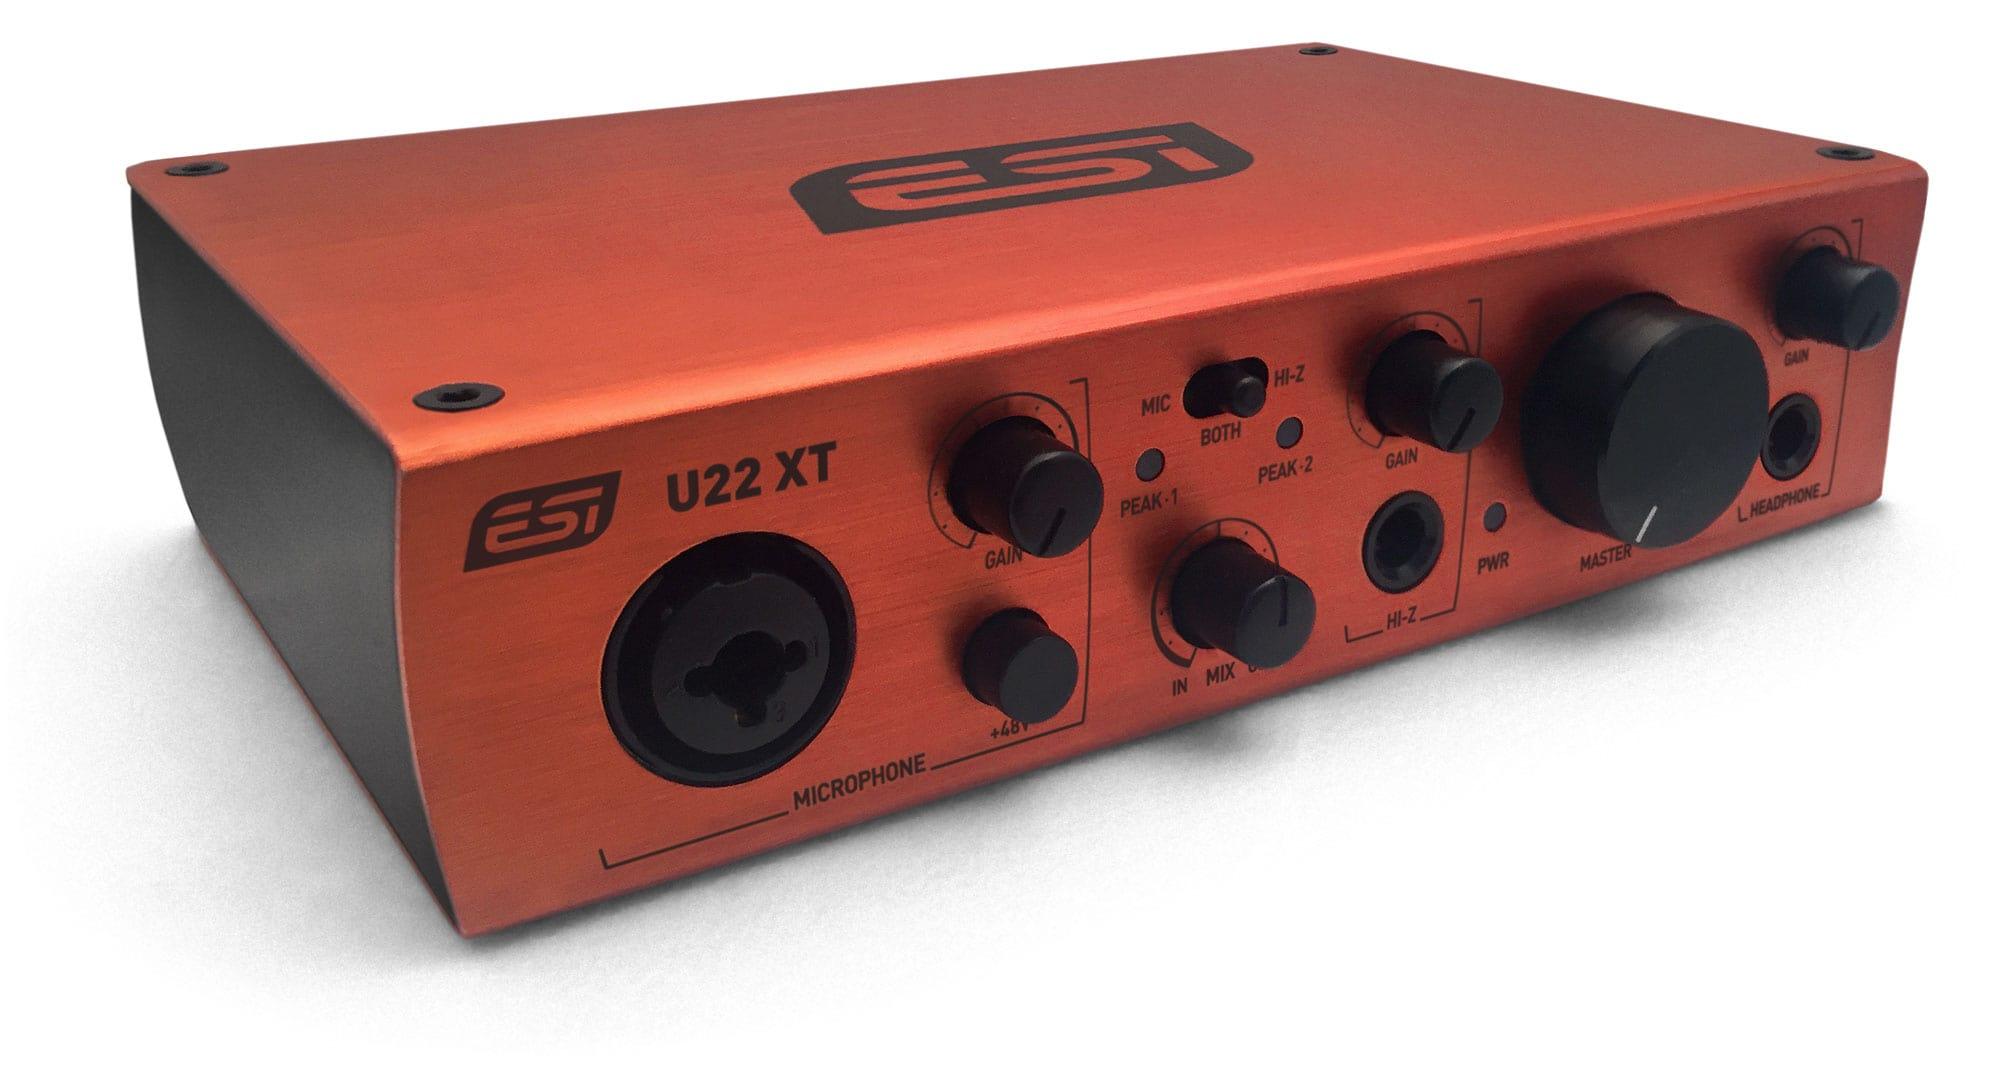 Pchardware - ESI U22 XT USB 2.0 Audiointerface - Onlineshop Musikhaus Kirstein